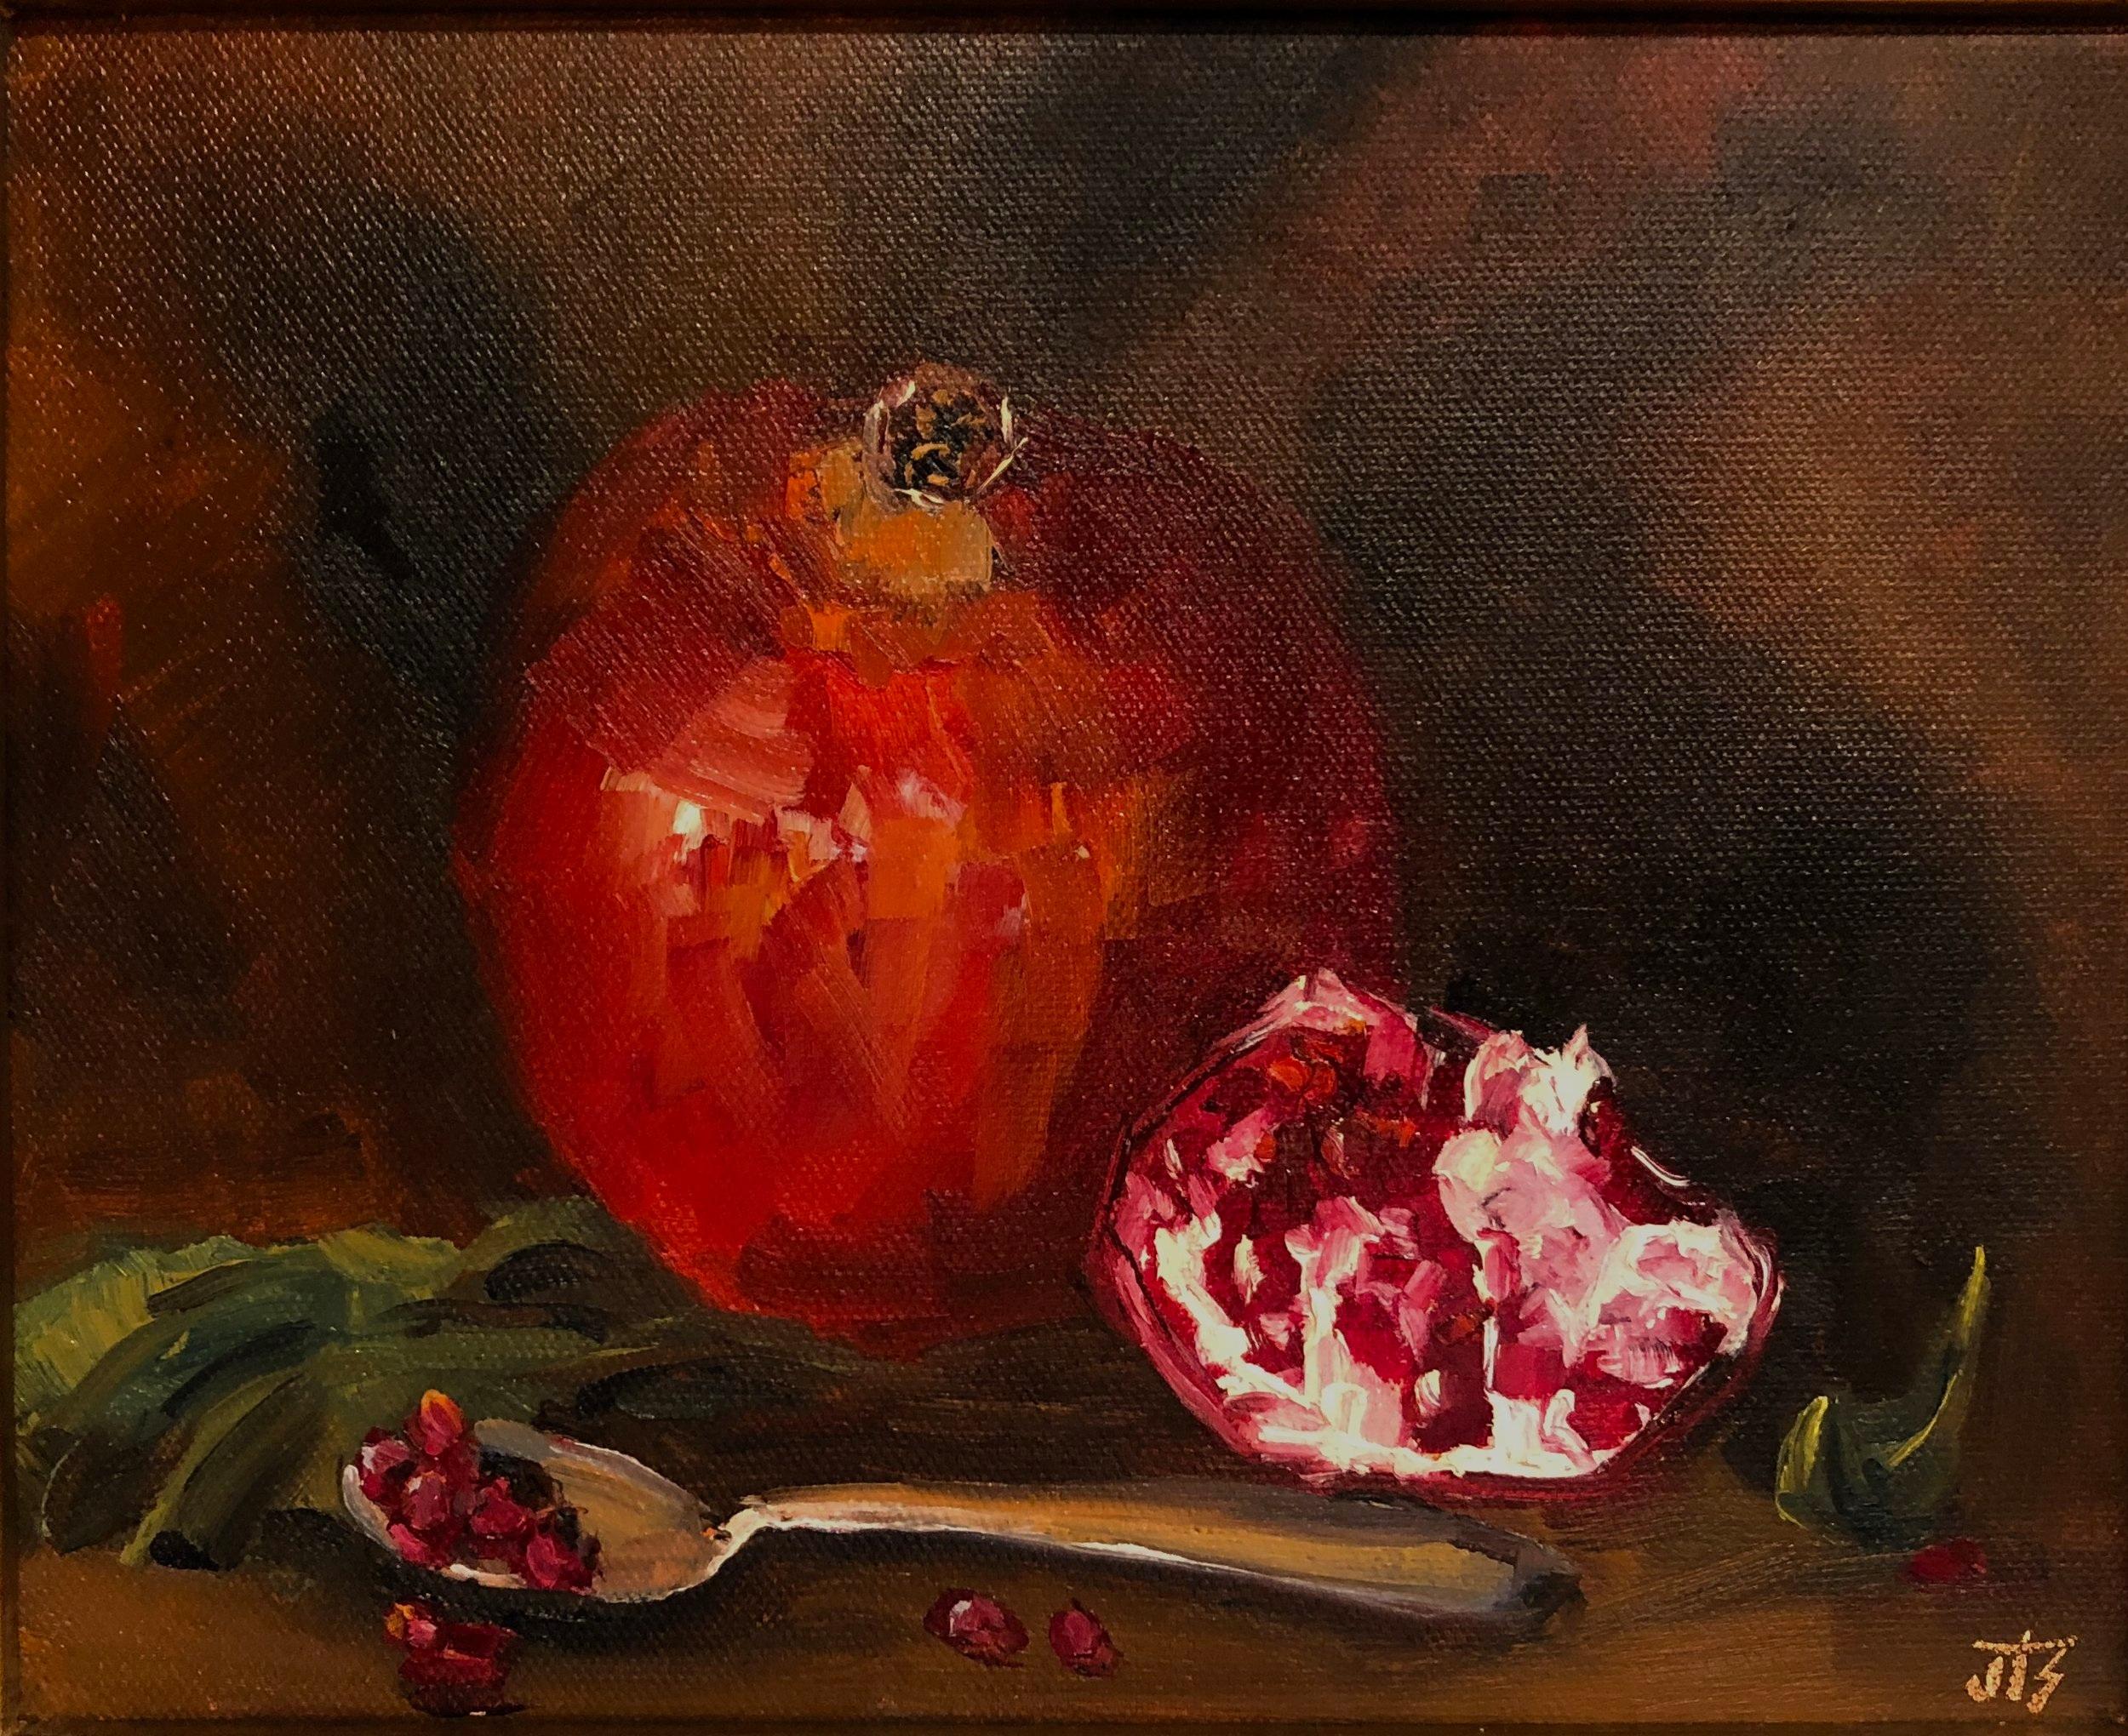 Pomegranate & Spoon